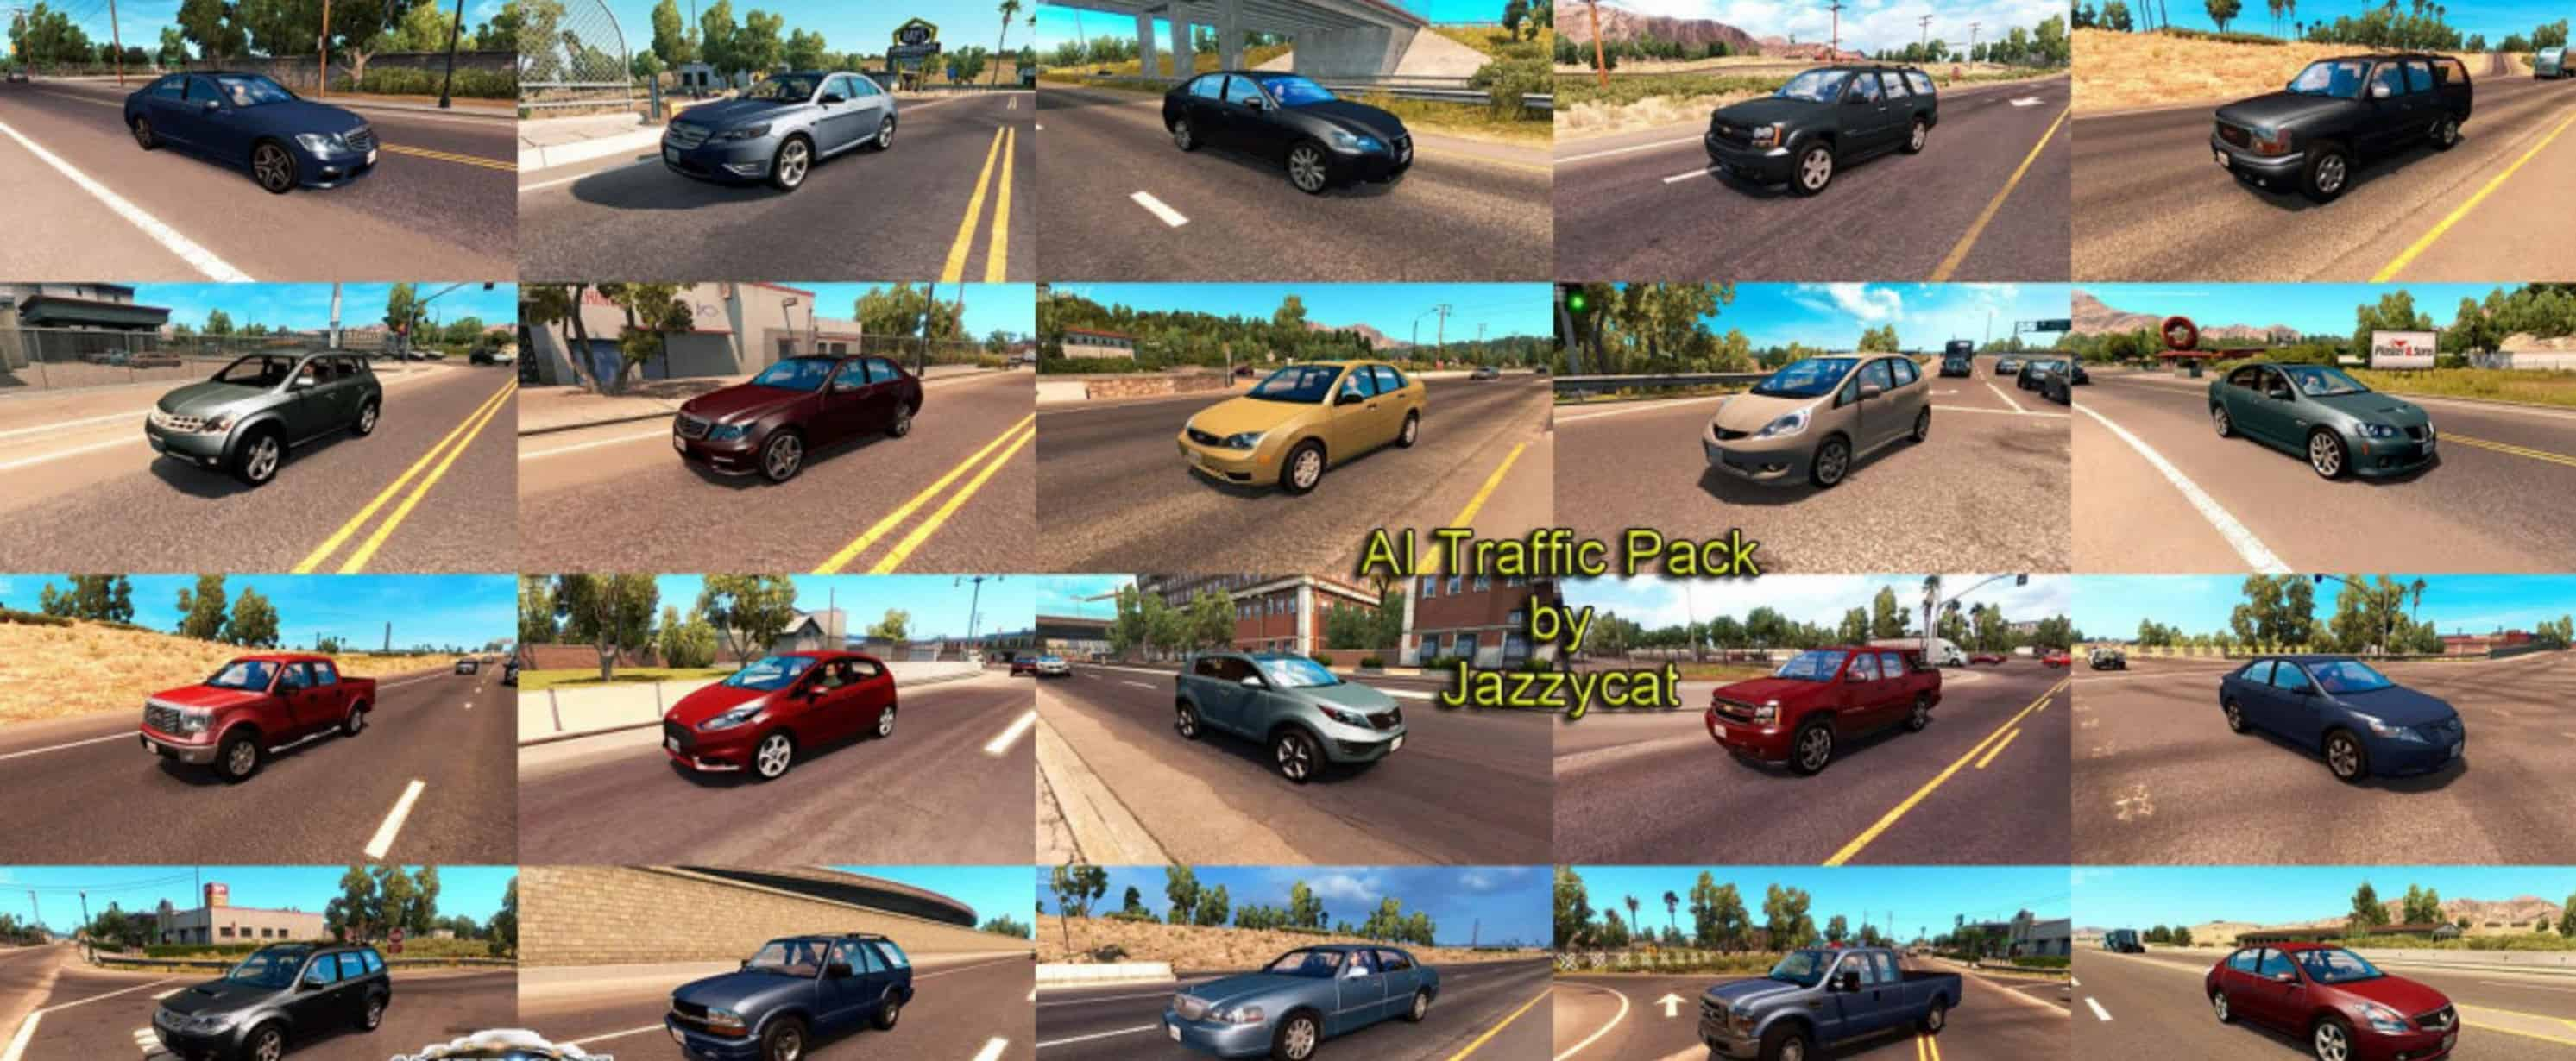 AI Traffic Pack by Jazzycat v1 7 - American Truck Simulator